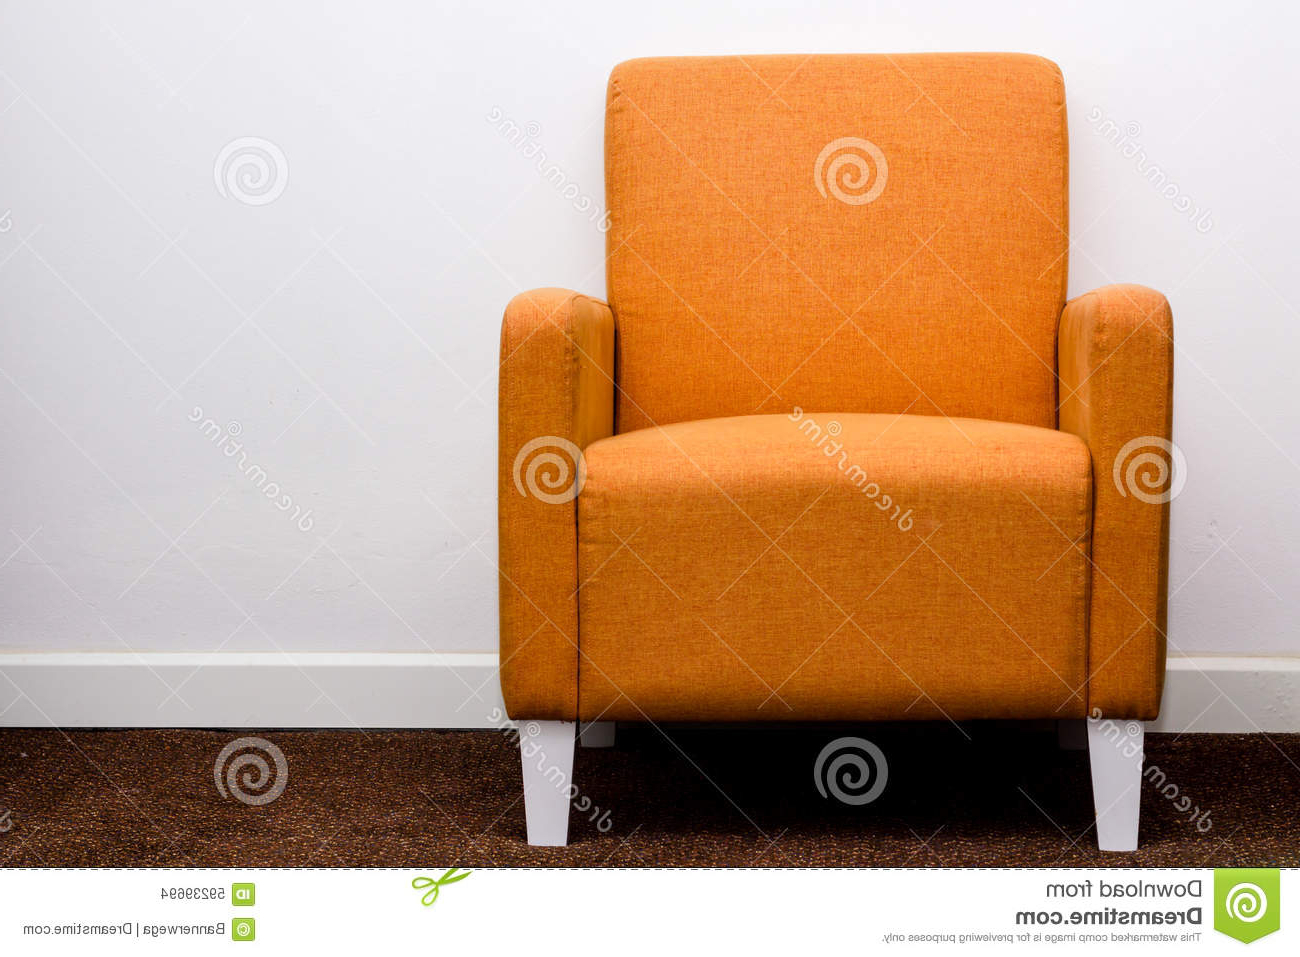 Well Known Orange Sofa Stock Photo. Image Of Luxury, Furniture, Home – 59239694 Regarding Orange Sofa Chairs (Gallery 7 of 20)